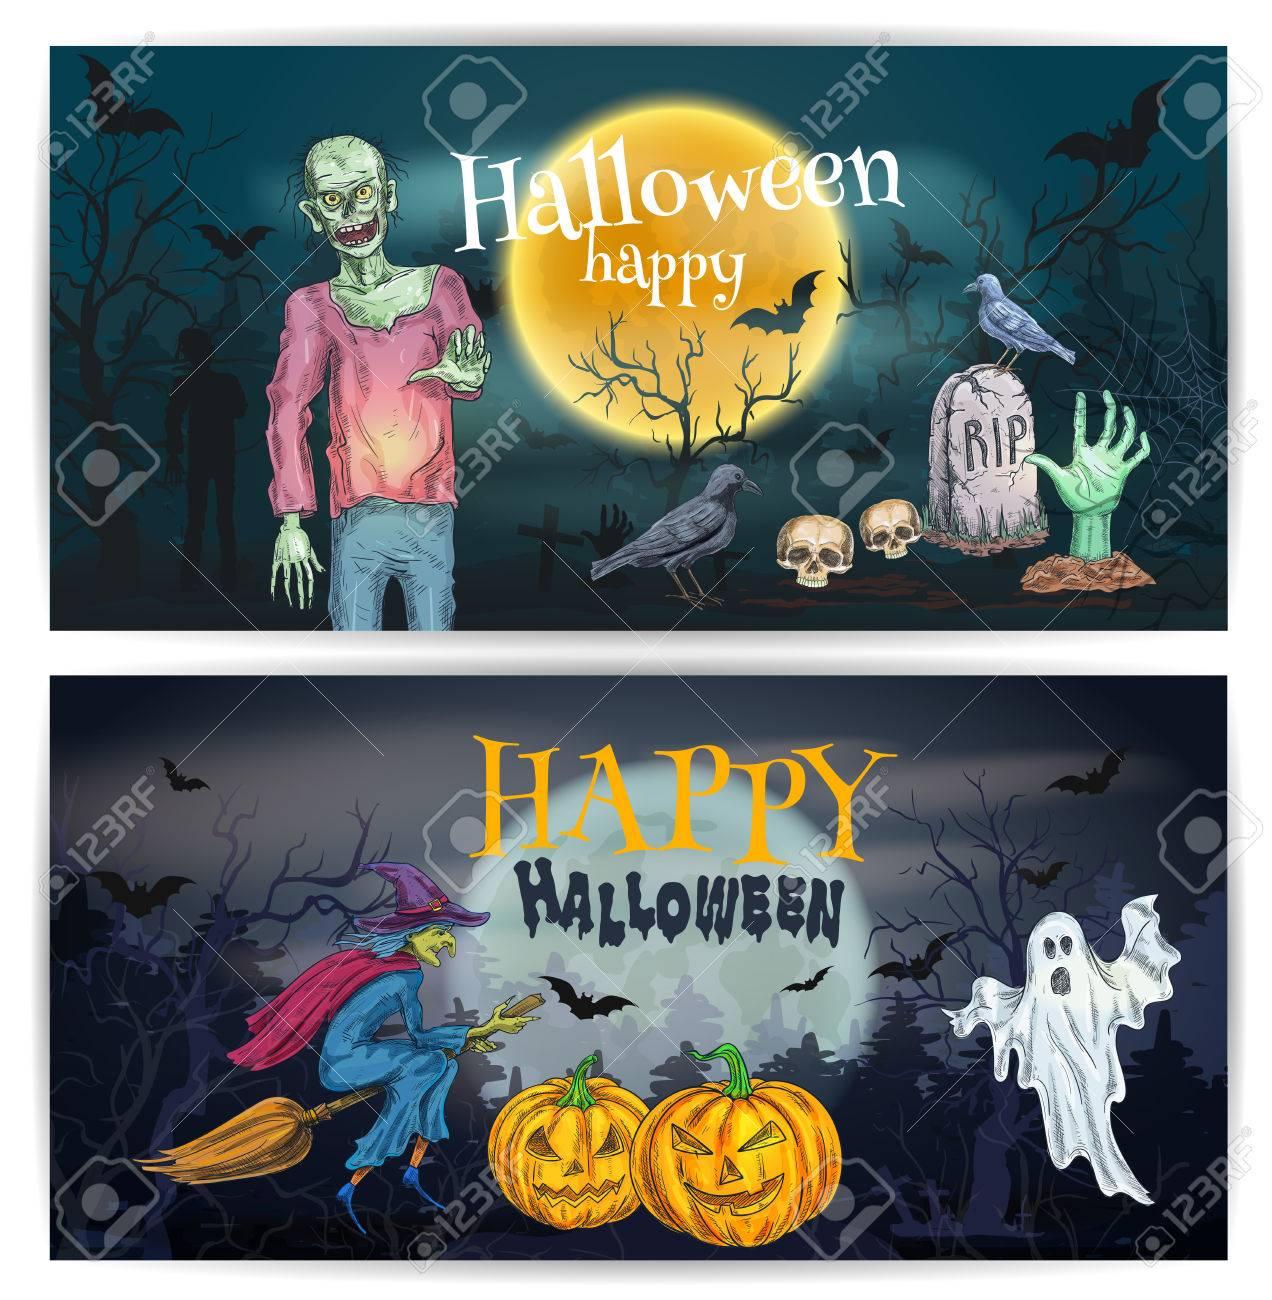 Spooky Halloween Pumpkin Lantern, Walking Zombie, Flying Ghost, Witch  Broom, Night Grave